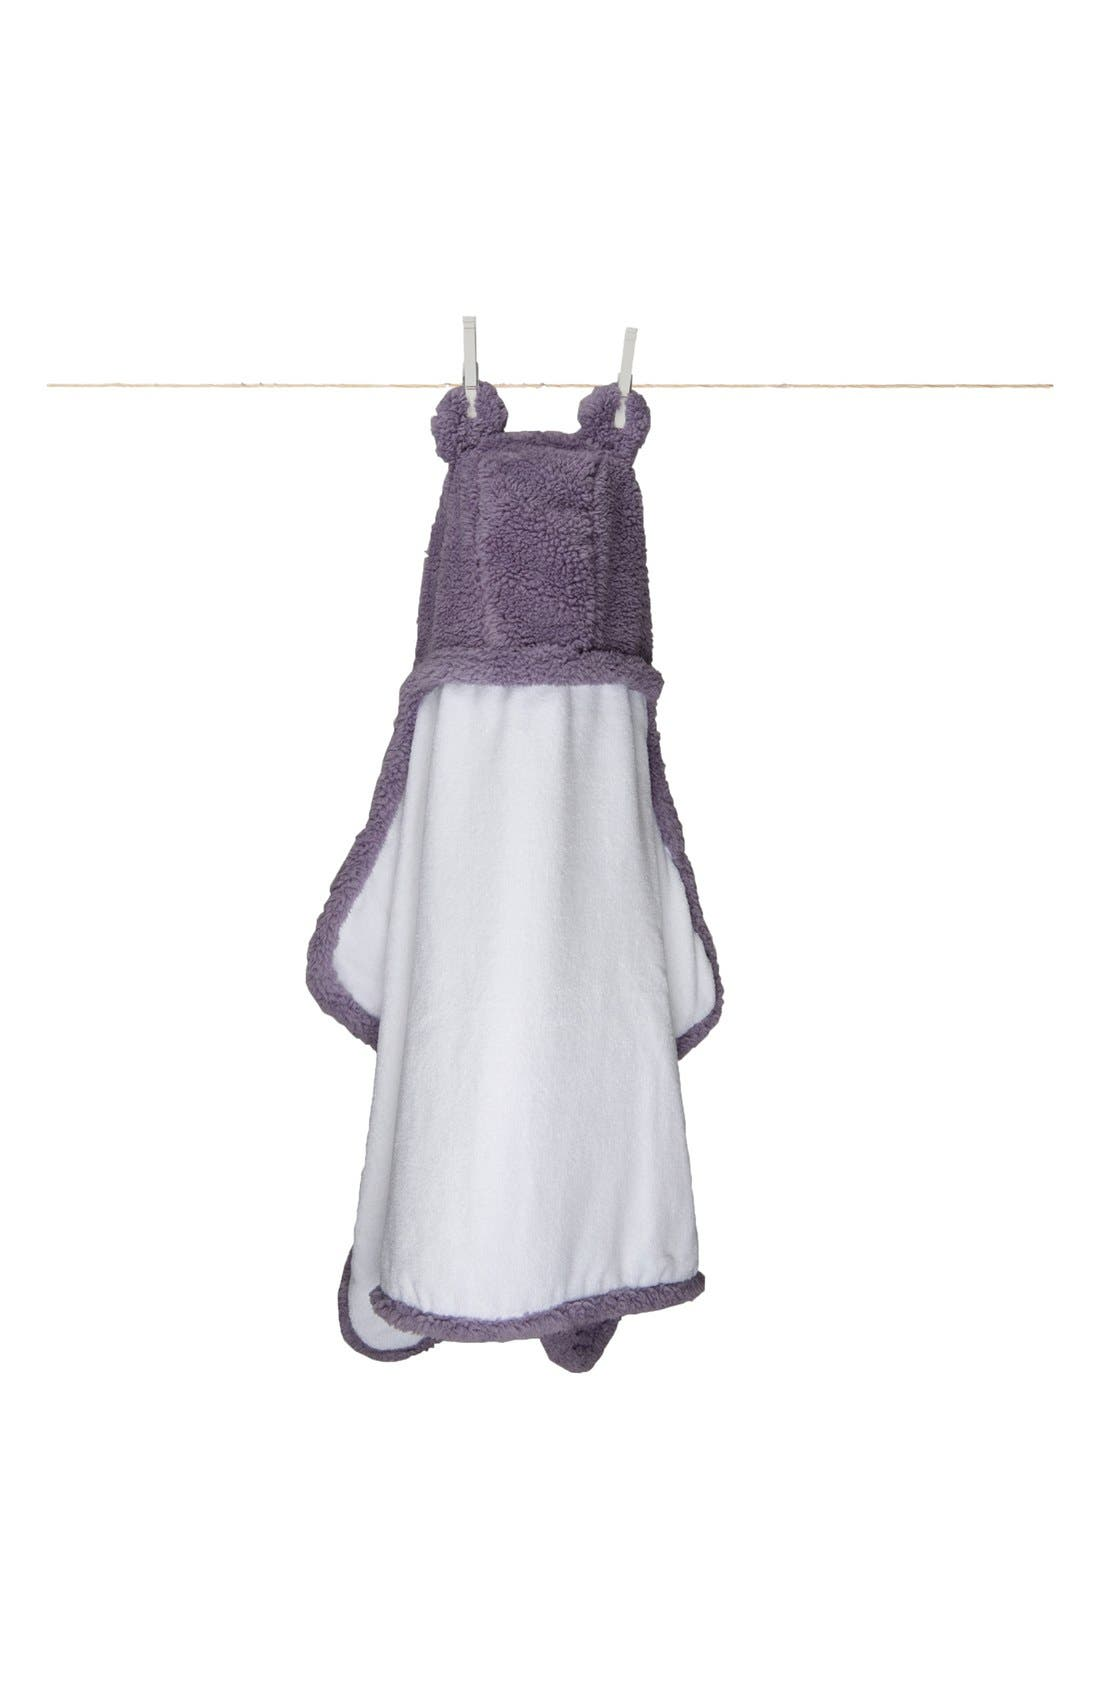 Alternate Image 1 Selected - Little Giraffe 'Bella™' Towel